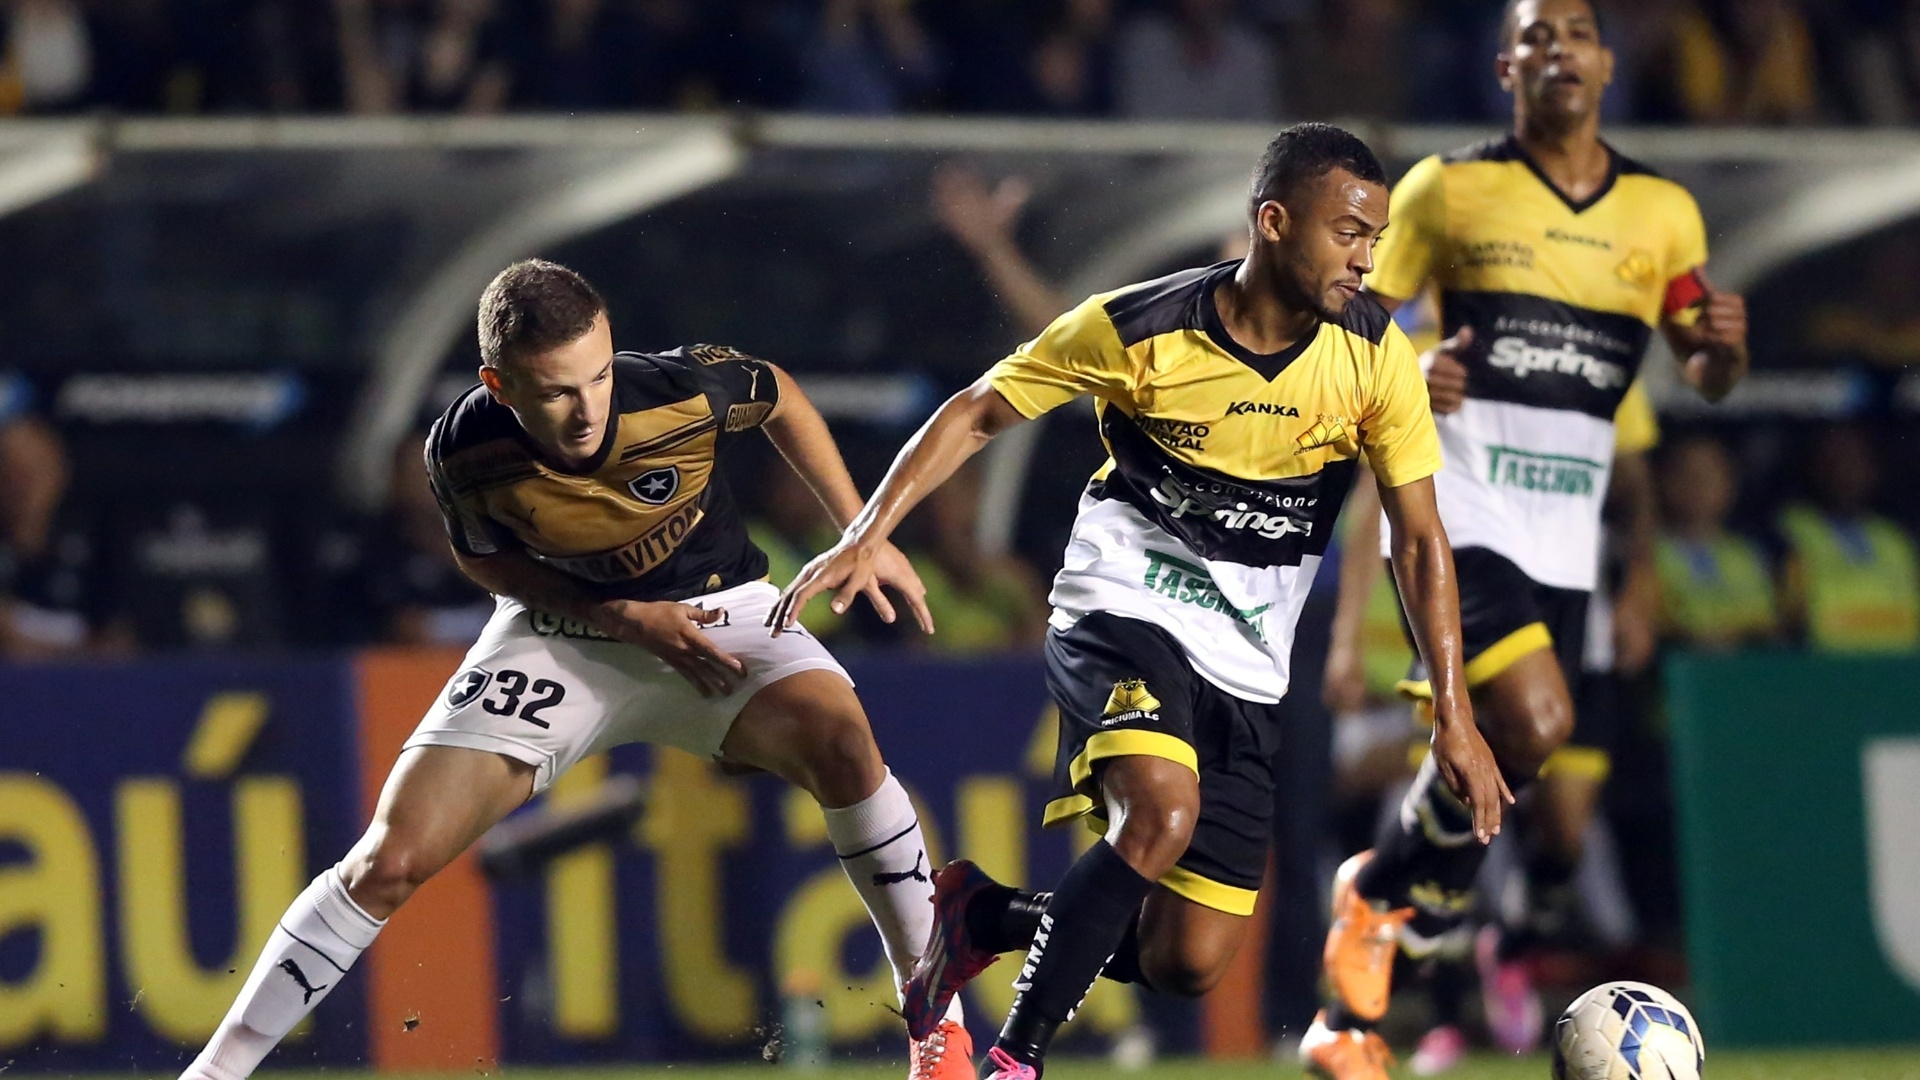 20. set. 2014 - João Victor, do Criciúma, consegue roubar bola de Sidney, do Botafogo, na partida entre as equipes, pelo Campeonato Brasileiro